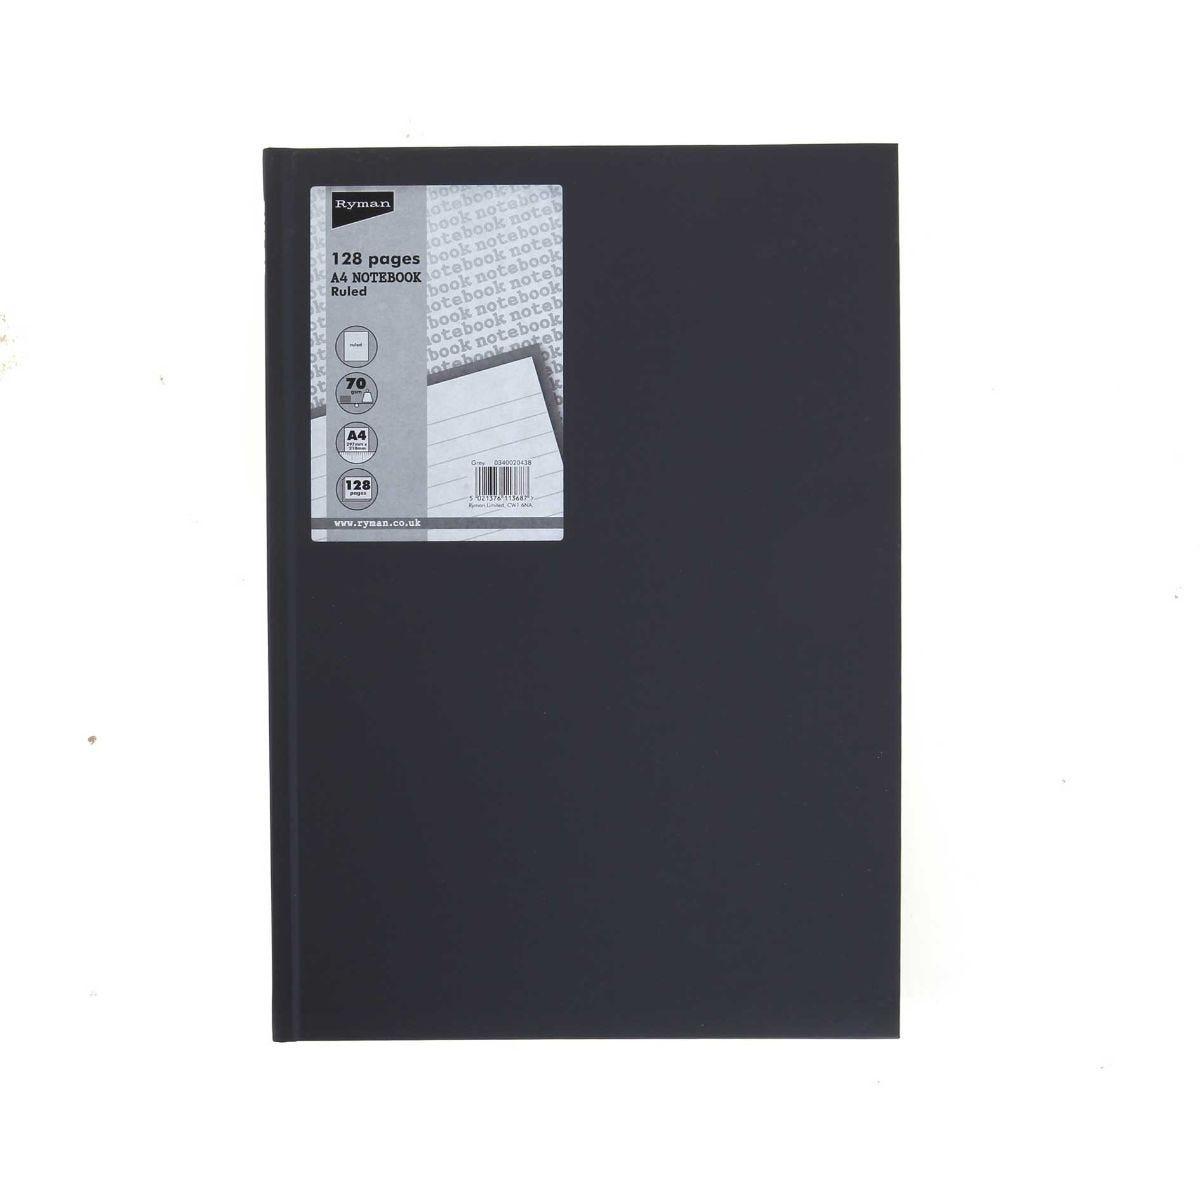 Ryman Casebound Notebook A4 128 Page 70gsm, Grey.